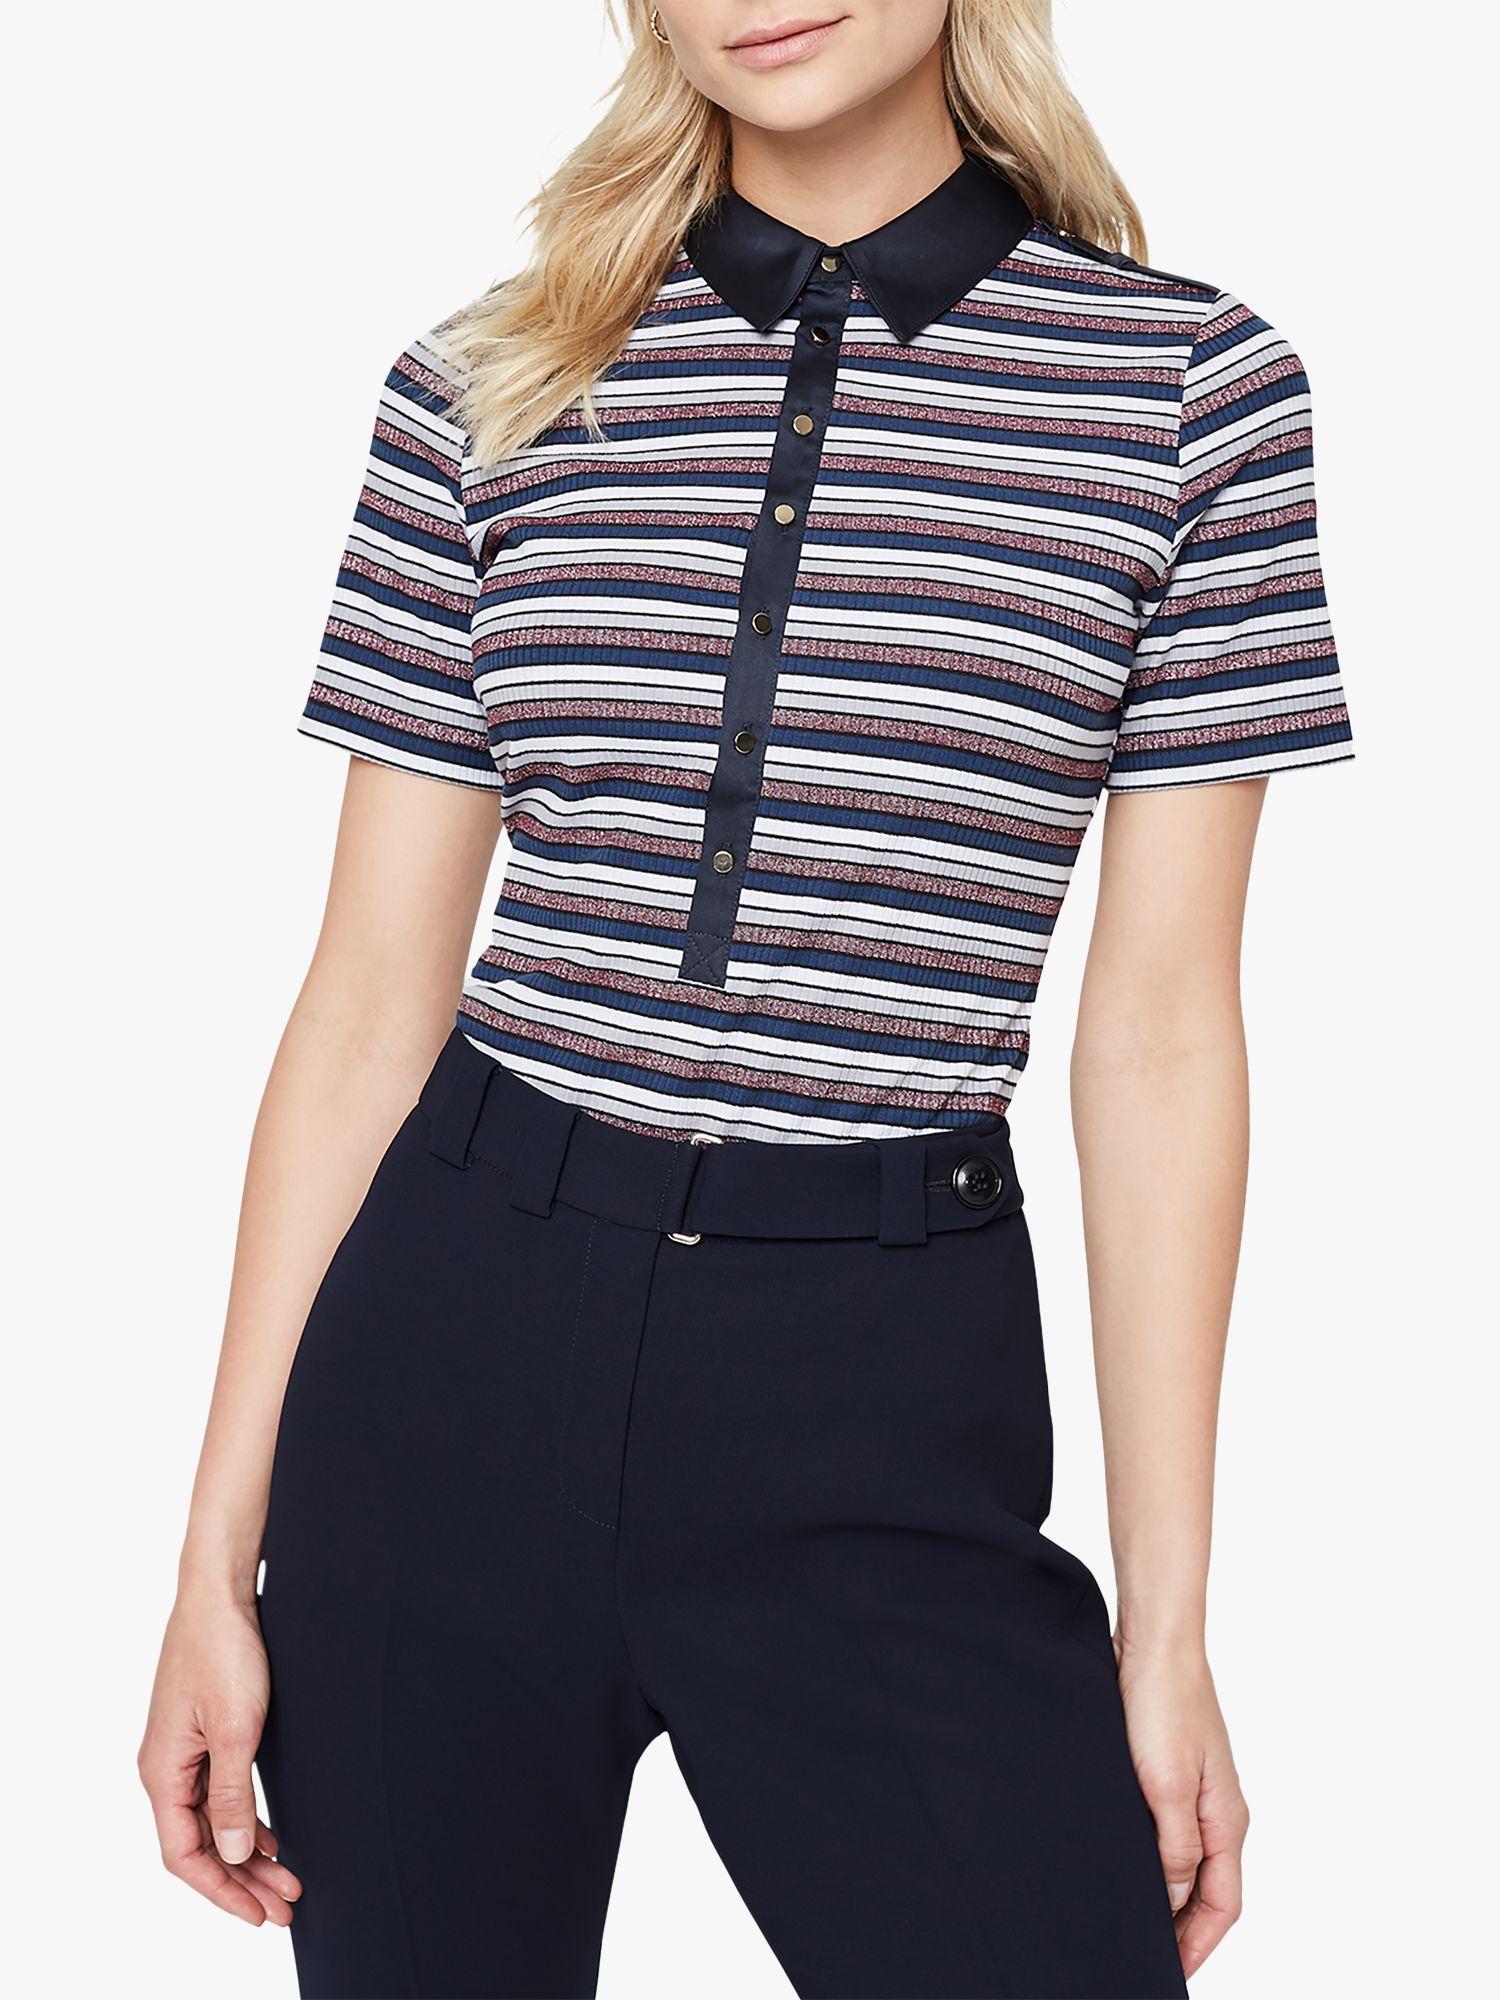 Damsel in a dress Damsel in a Dress Ciri Stripe T-Shirt, Multi